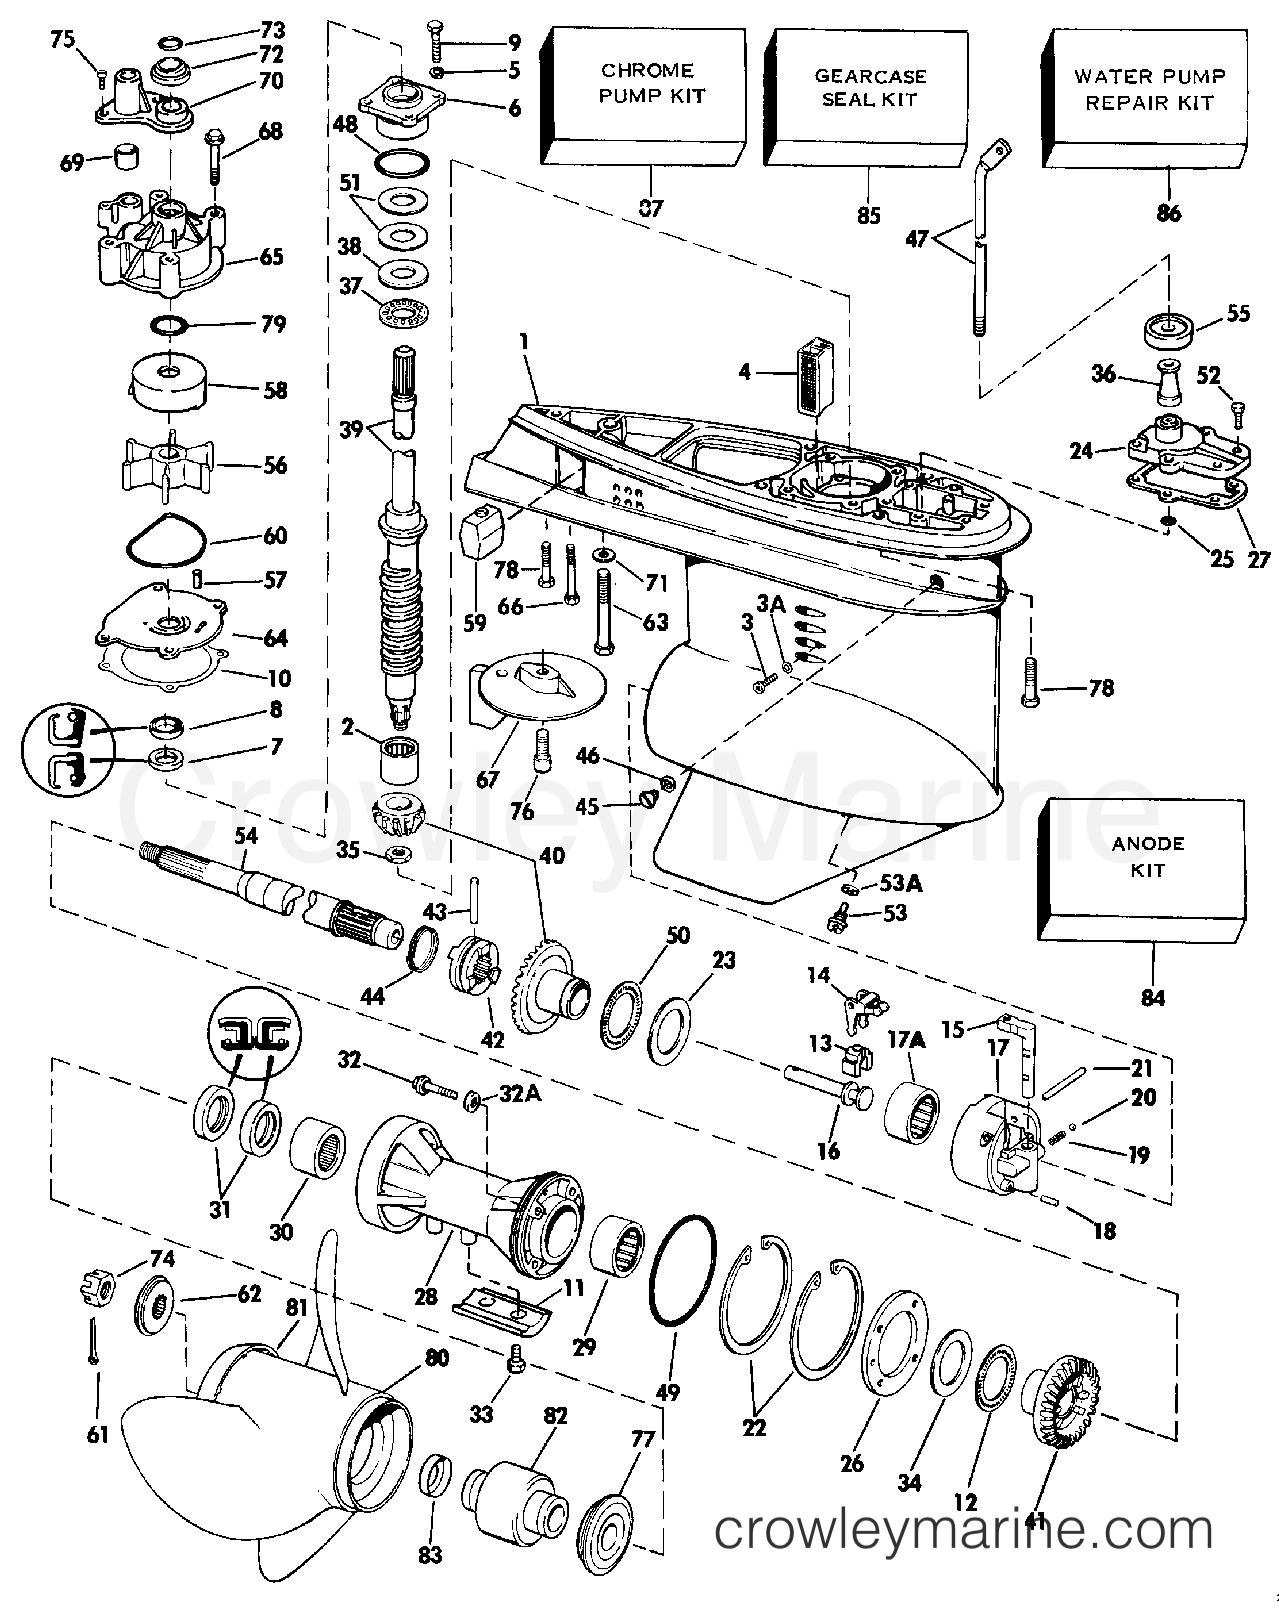 1986 Evinrude Outboards 120 - E120TLCDC GEARCASE section